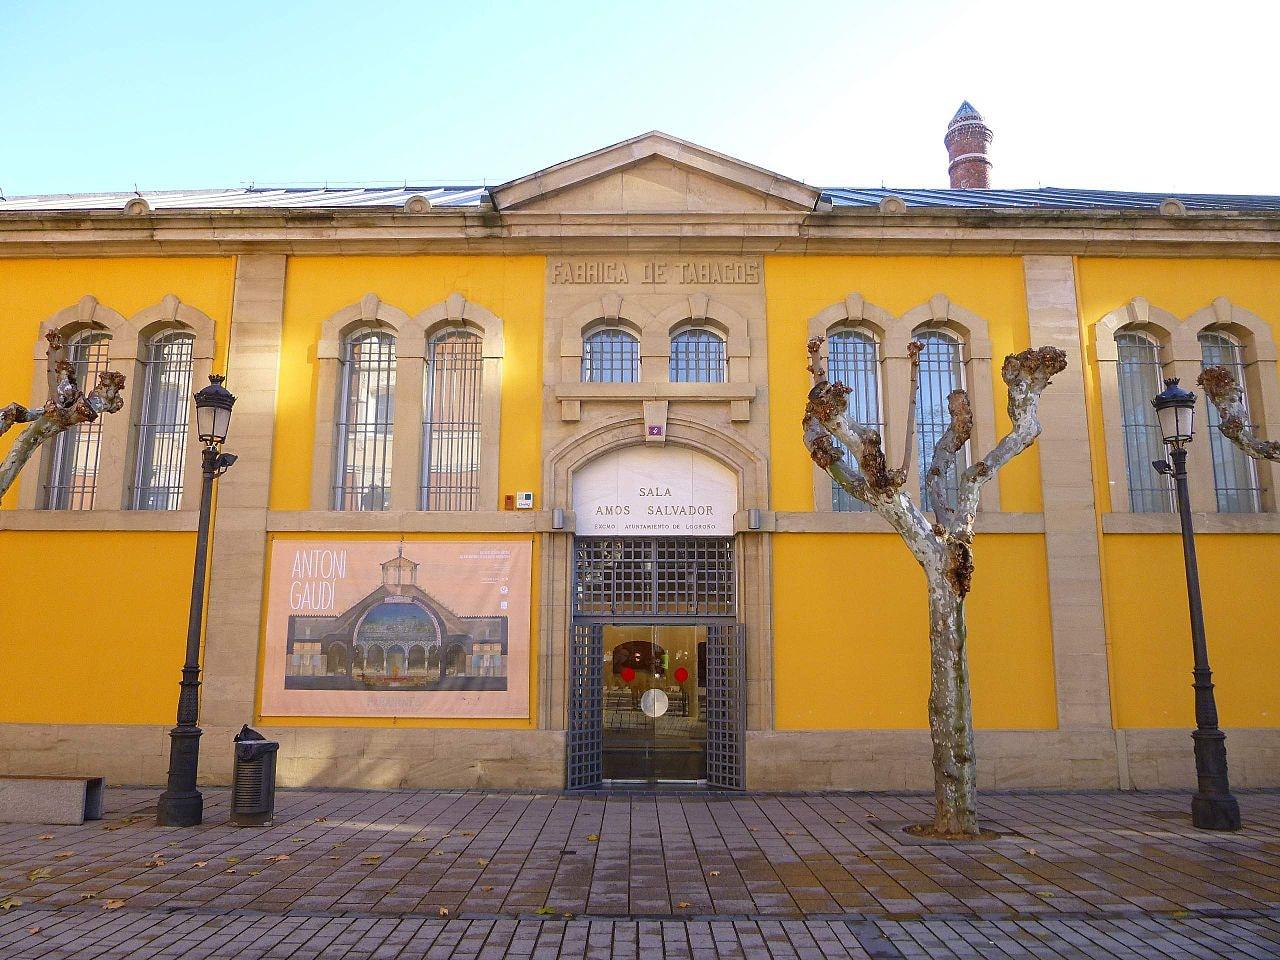 Sala Amós Salvador, Logroño, Spain | ©Zarateman / Wikimedia Commons